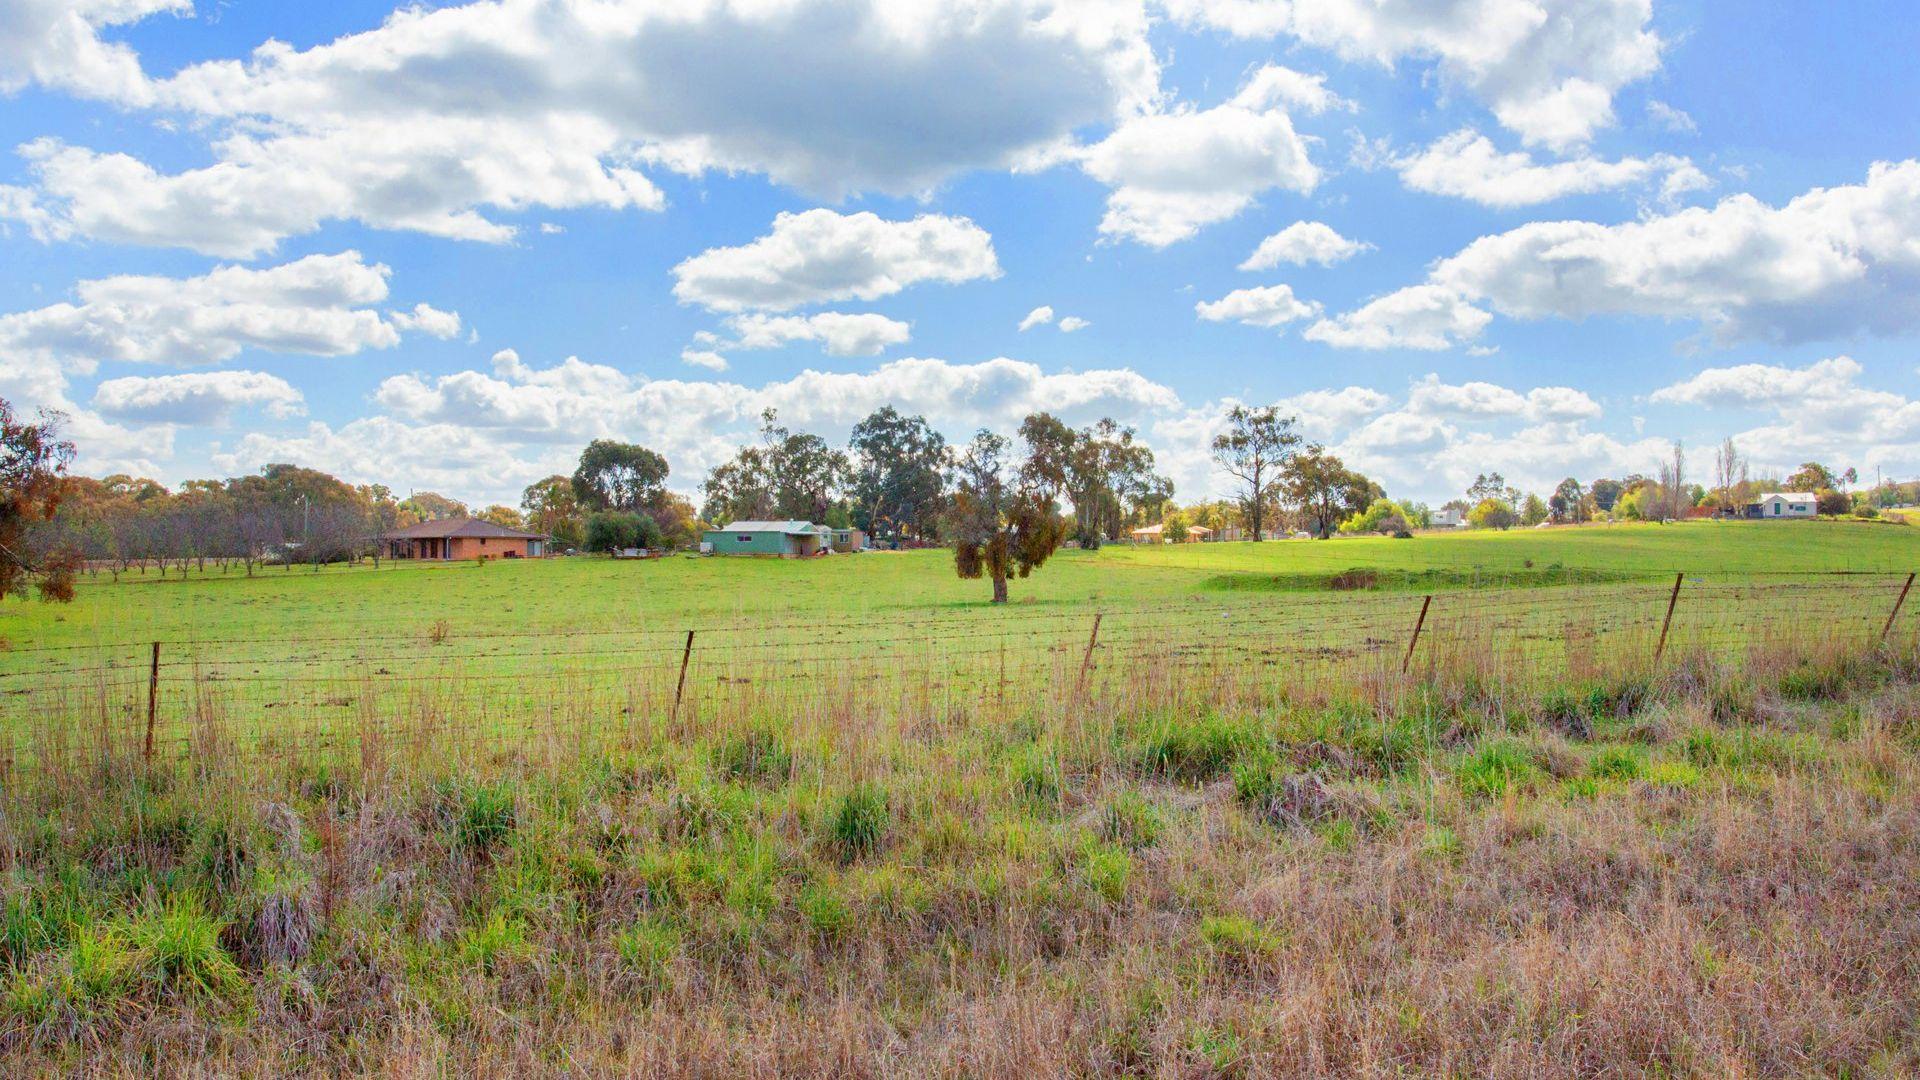 190 Waugoola Street (Woodstock), Cowra NSW 2794, Image 2